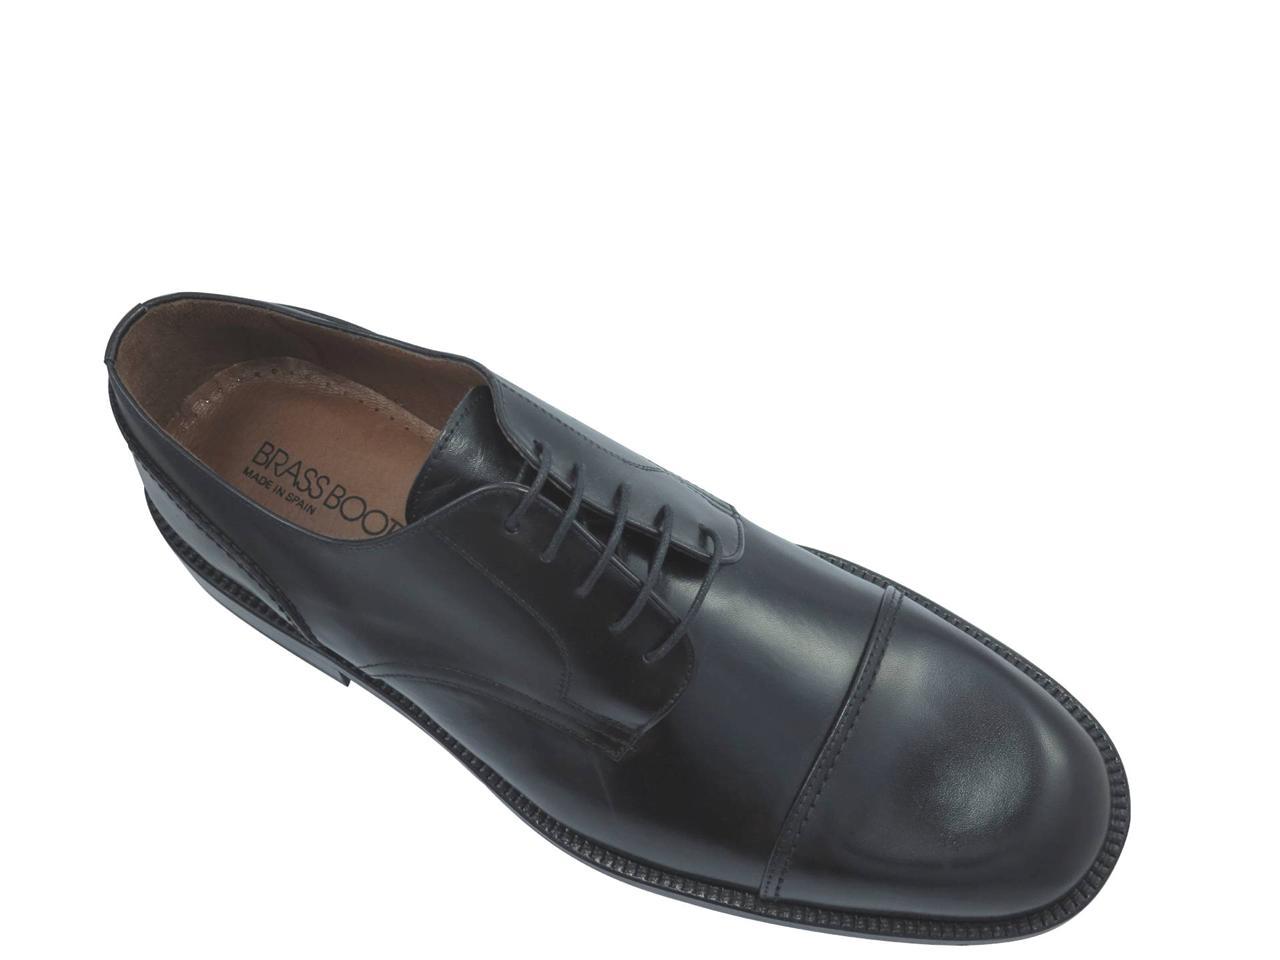 brass boot seville s lace up shoes black ebay